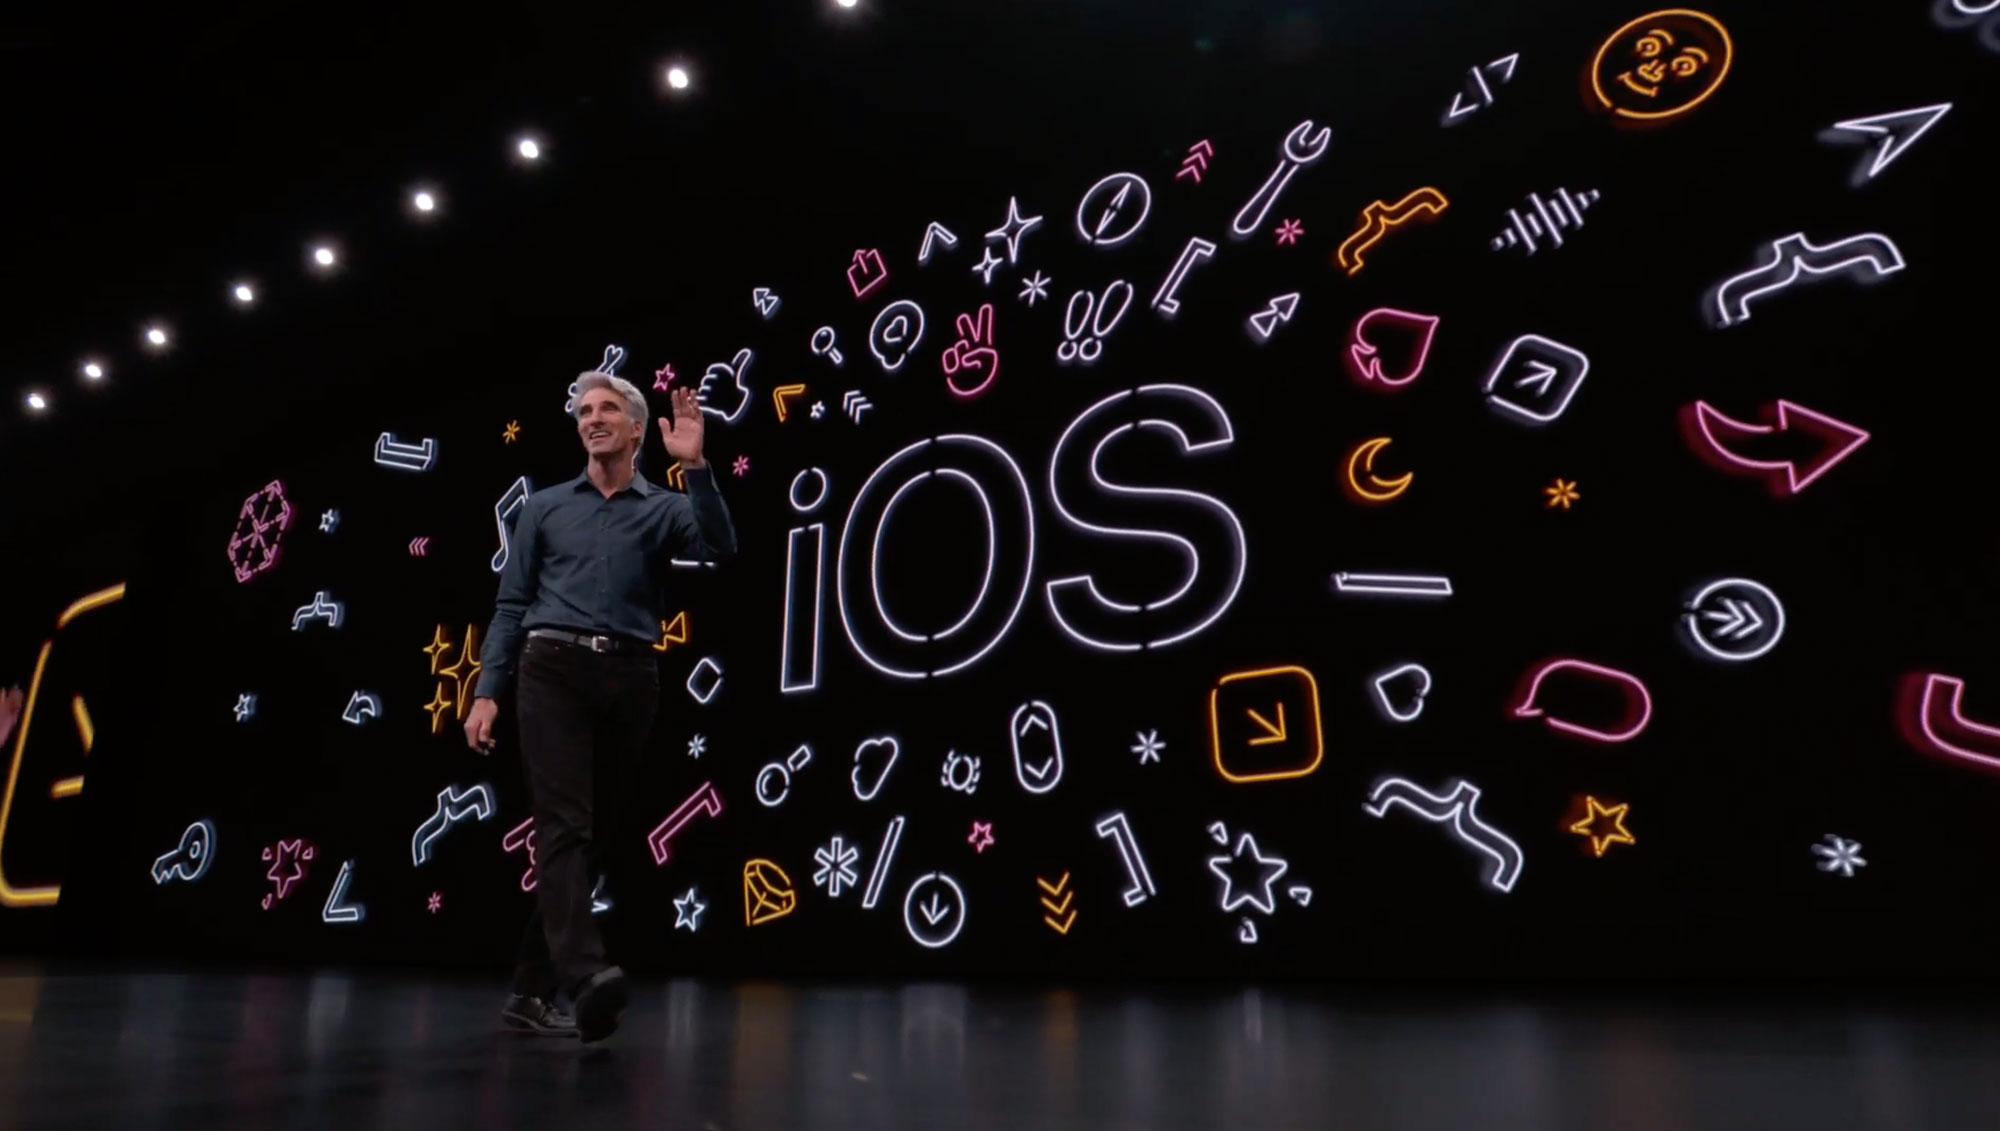 iOS 13数十项隐藏功能汇总:控制中心能修改WiFi